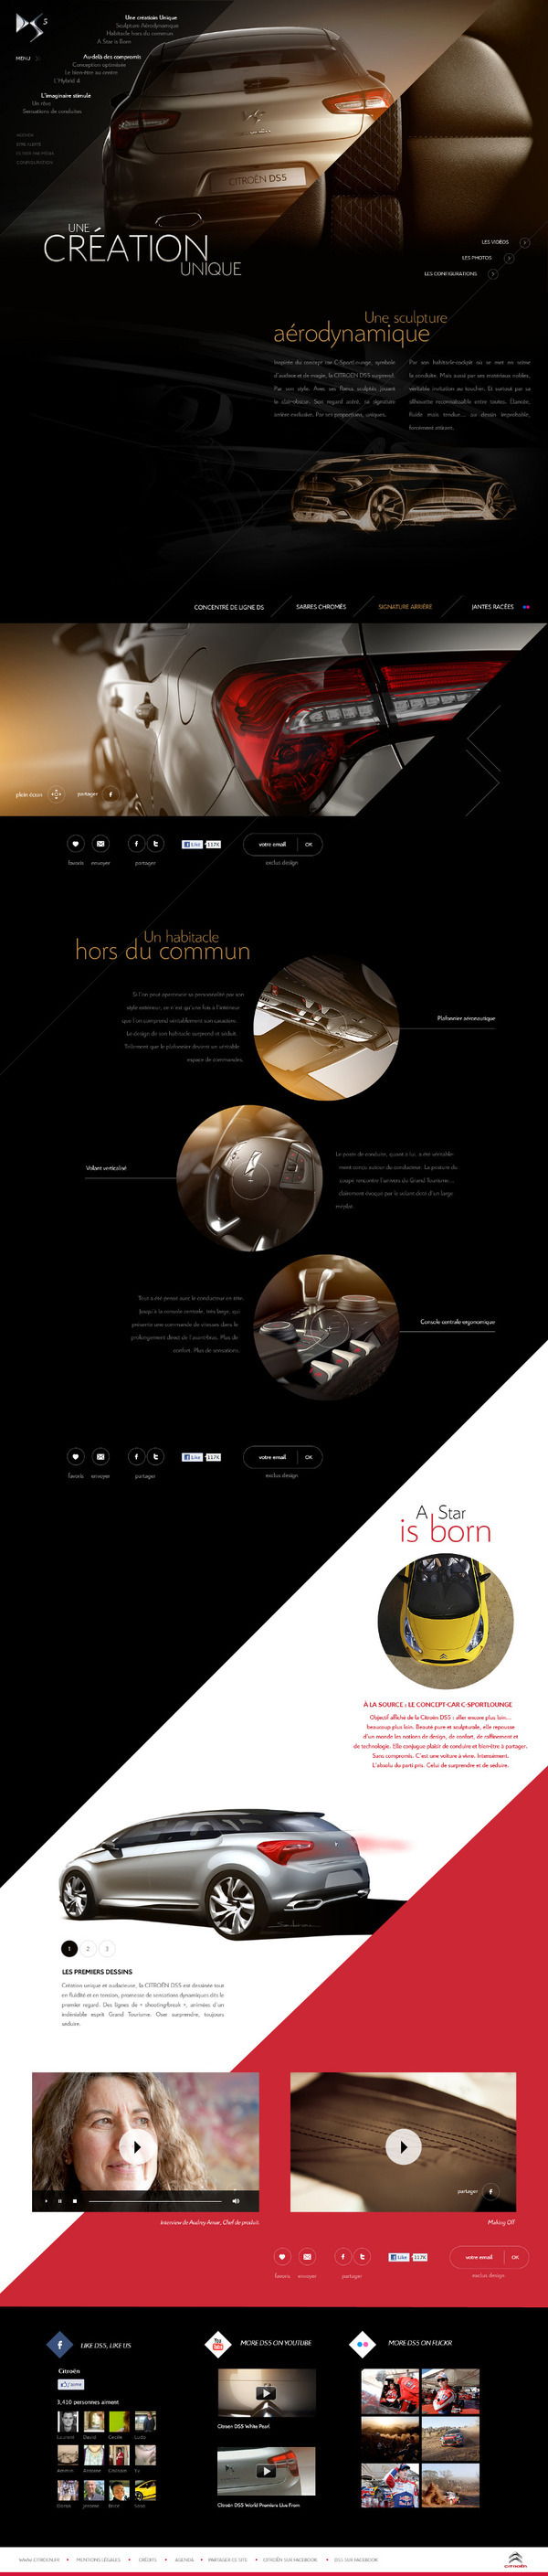 Citroën DS5 by Big Youth , via Behance Web layout design